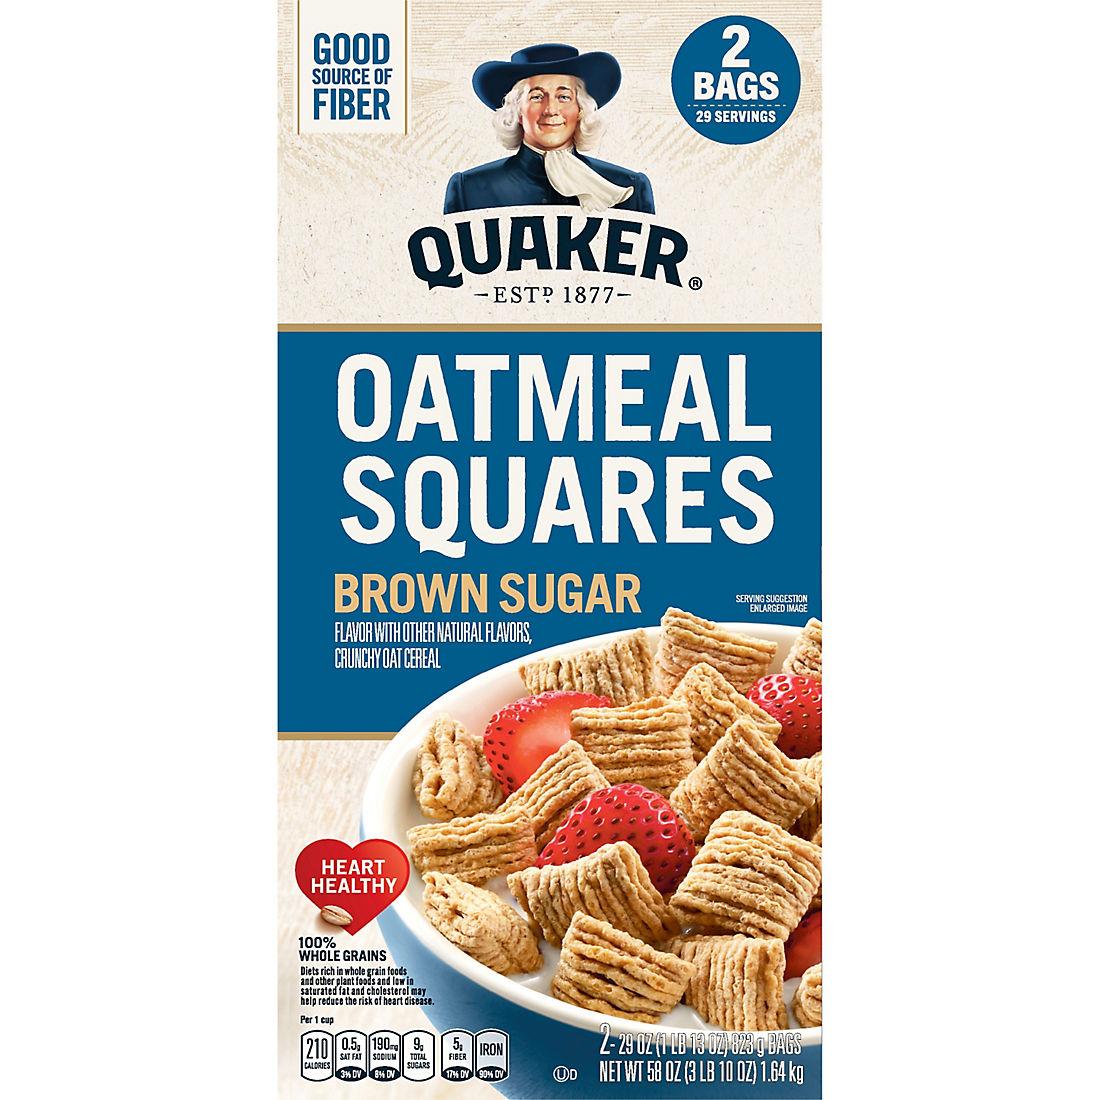 Quaker Oatmeal Squares, 2 pk./29 oz